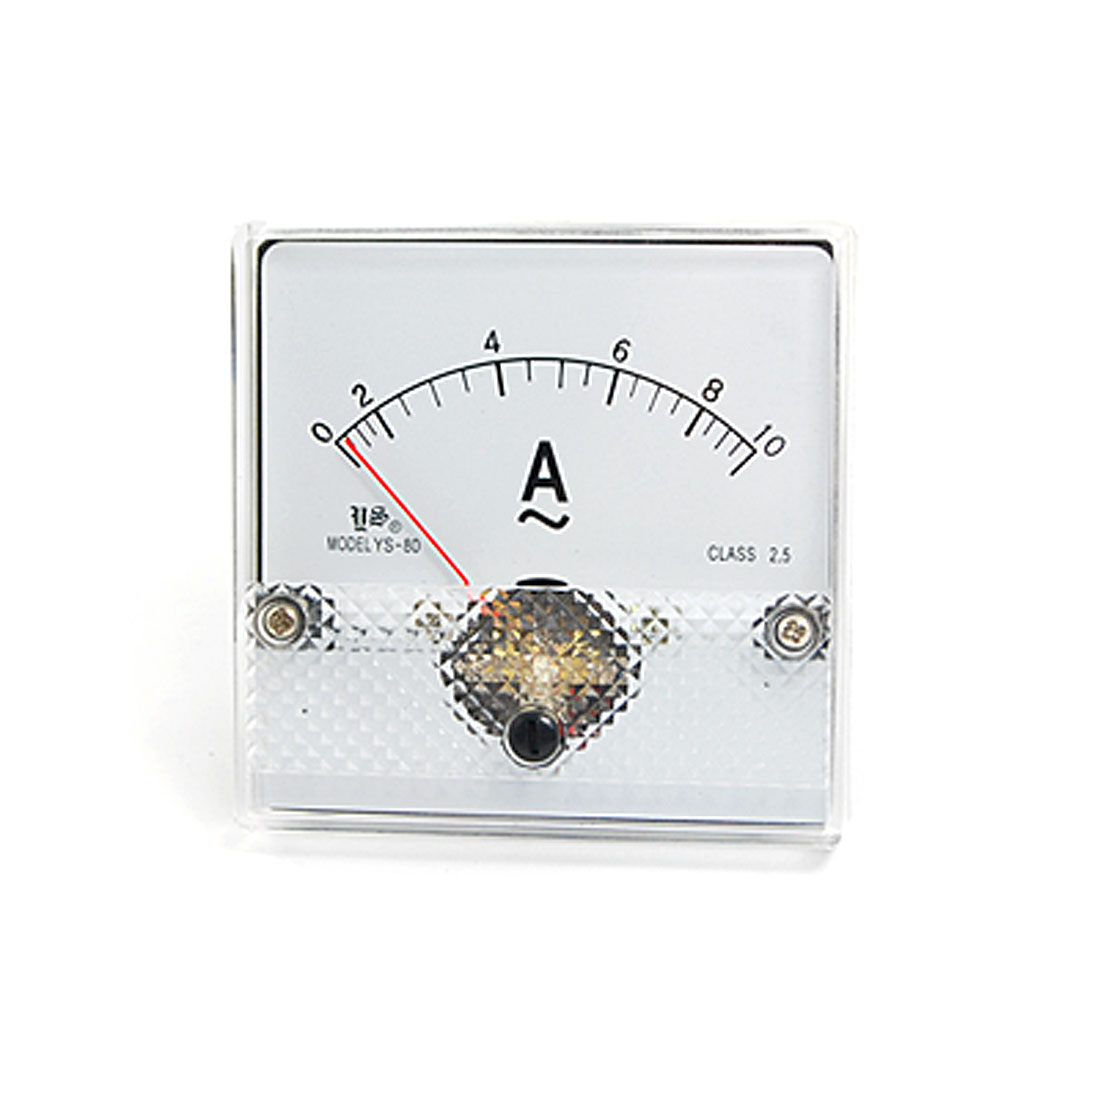 AC 0-10A Current Range Analog Panel Meter Ammeter YS-80